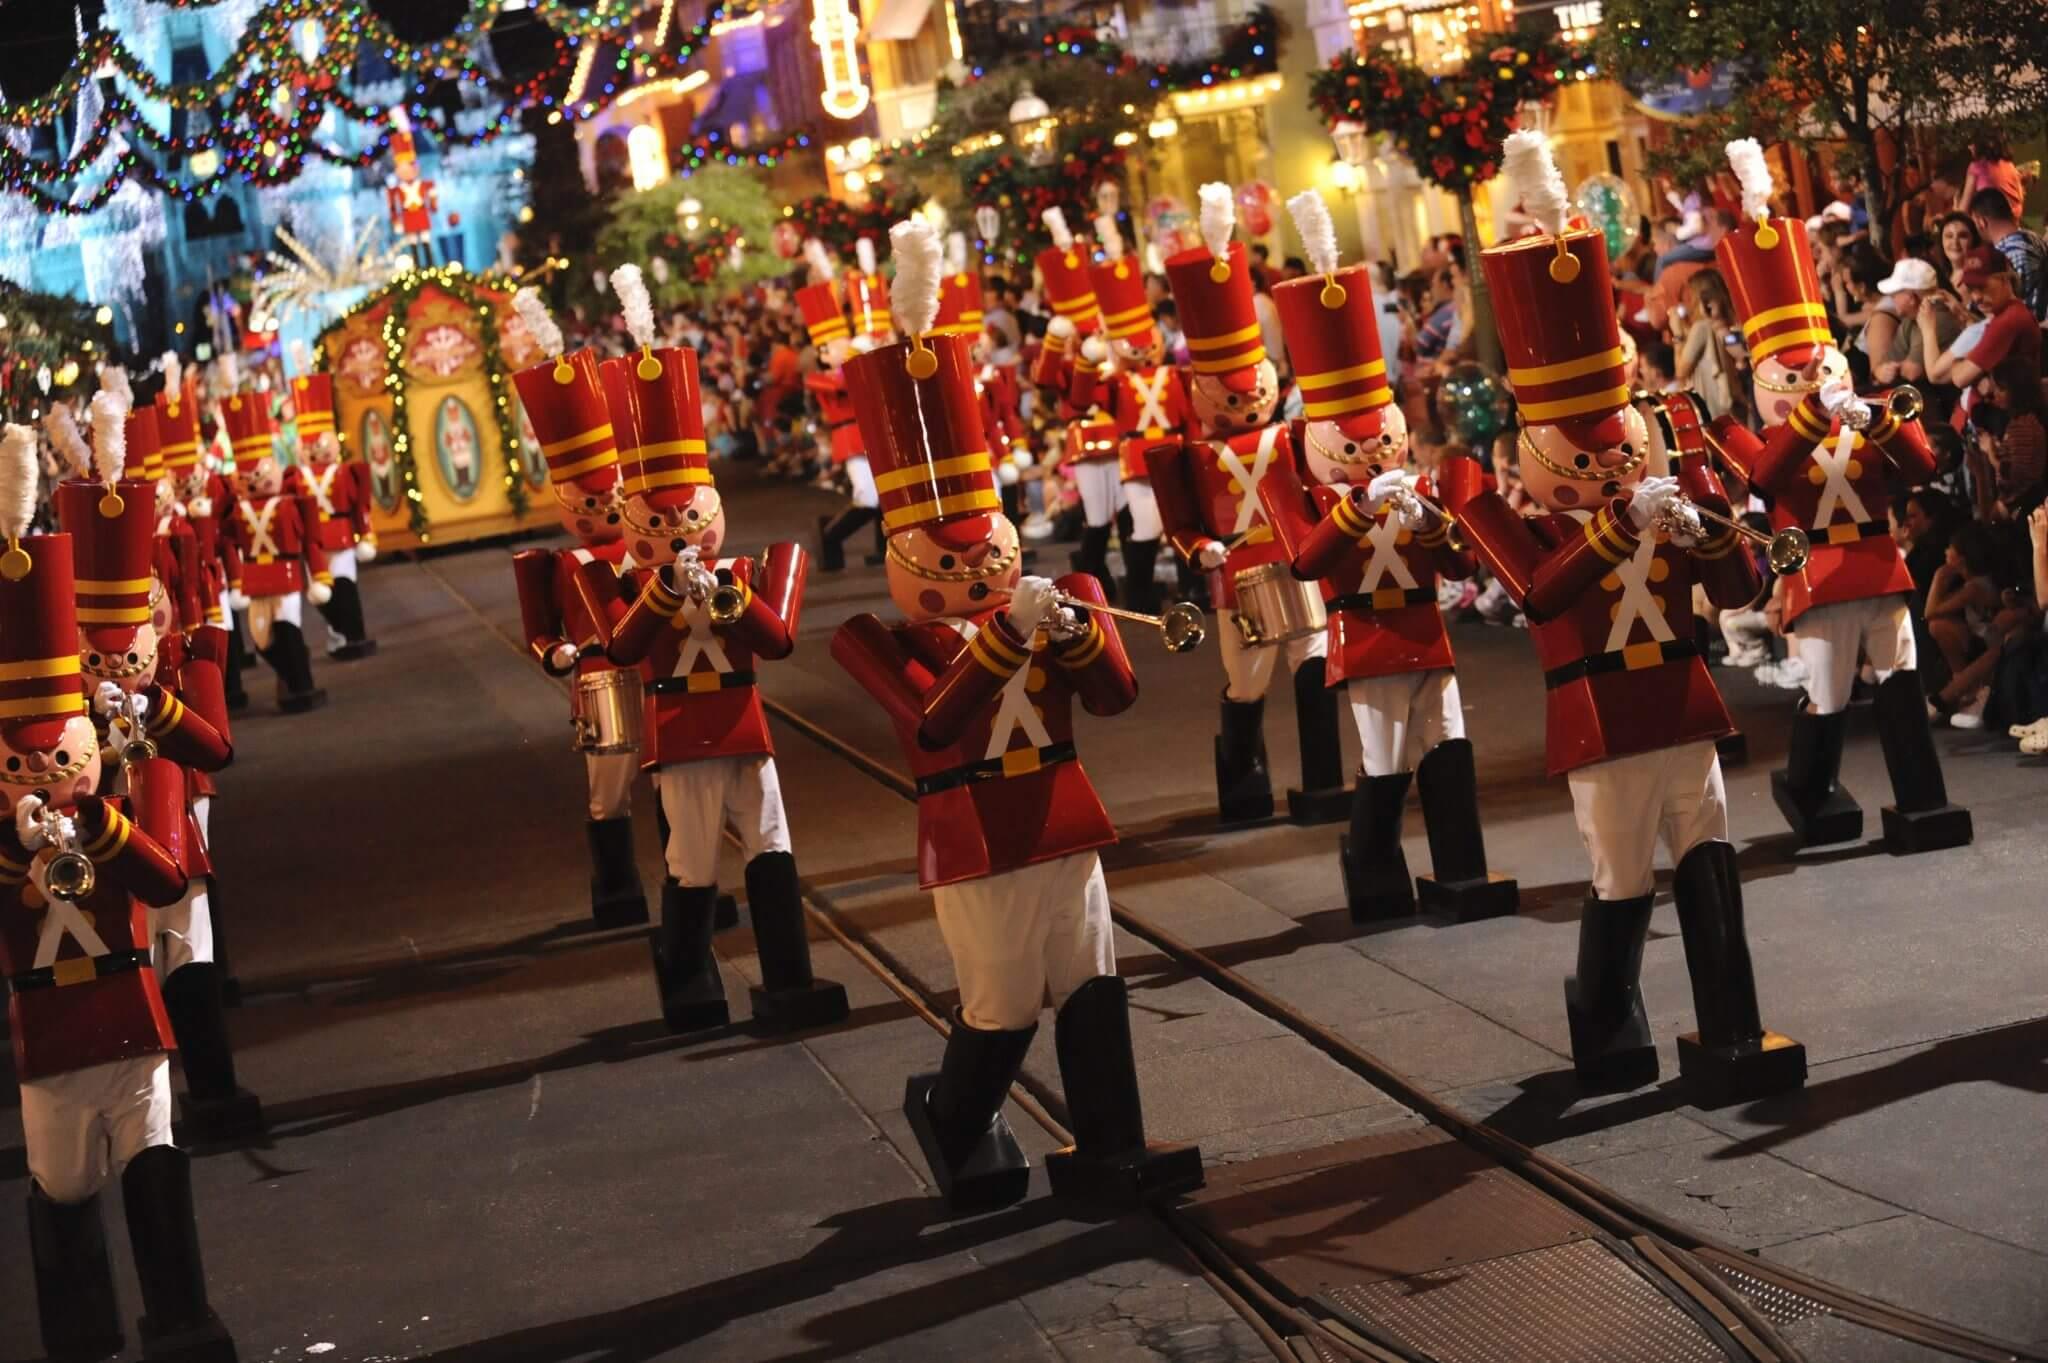 Mickeys-very-merry-christmas-party-parade